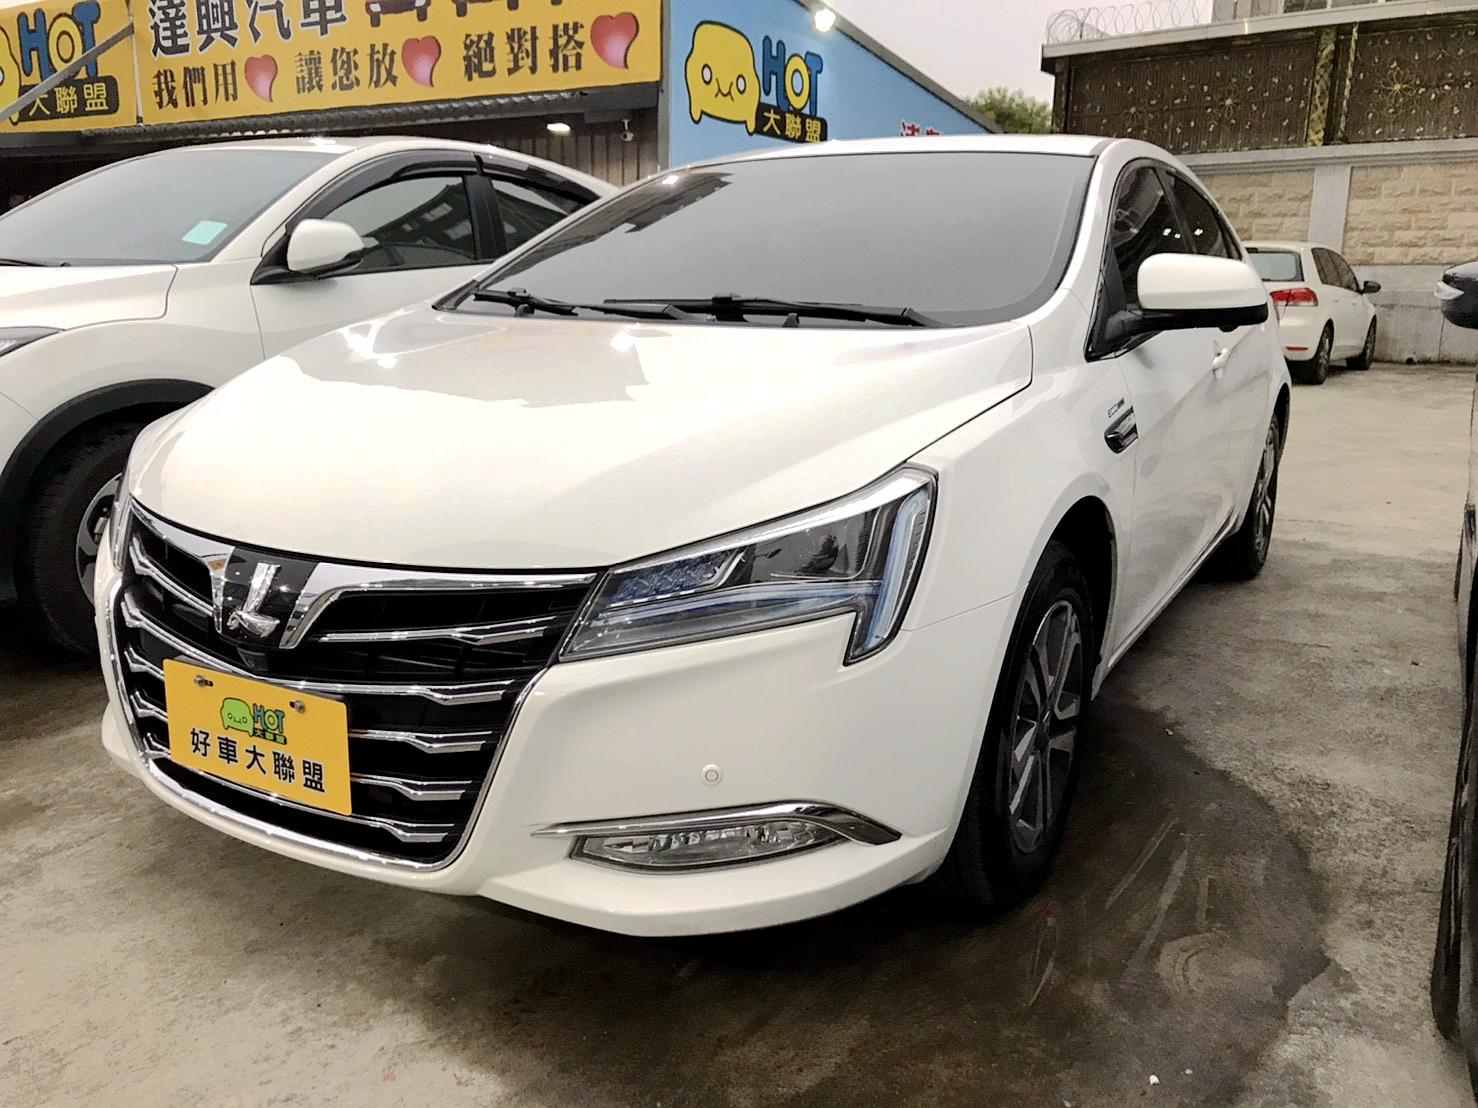 2018 Luxgen 納智捷 S5 Turbo